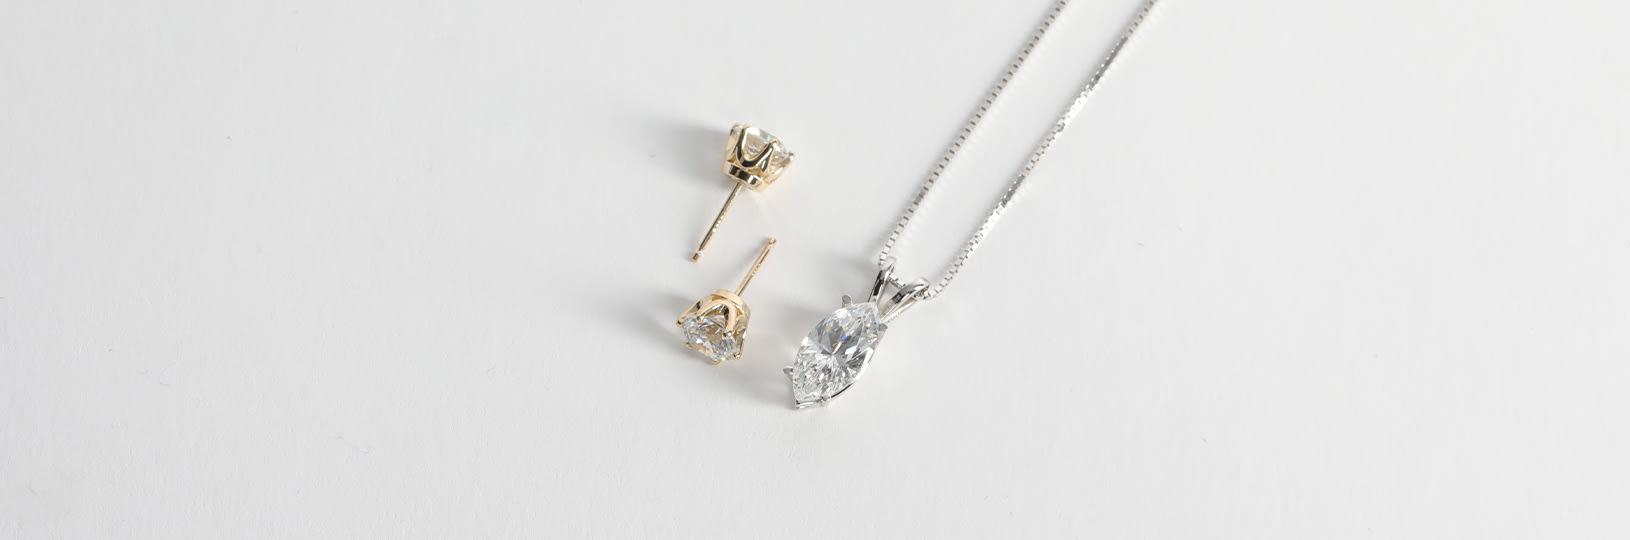 Mismatched jewelry set.